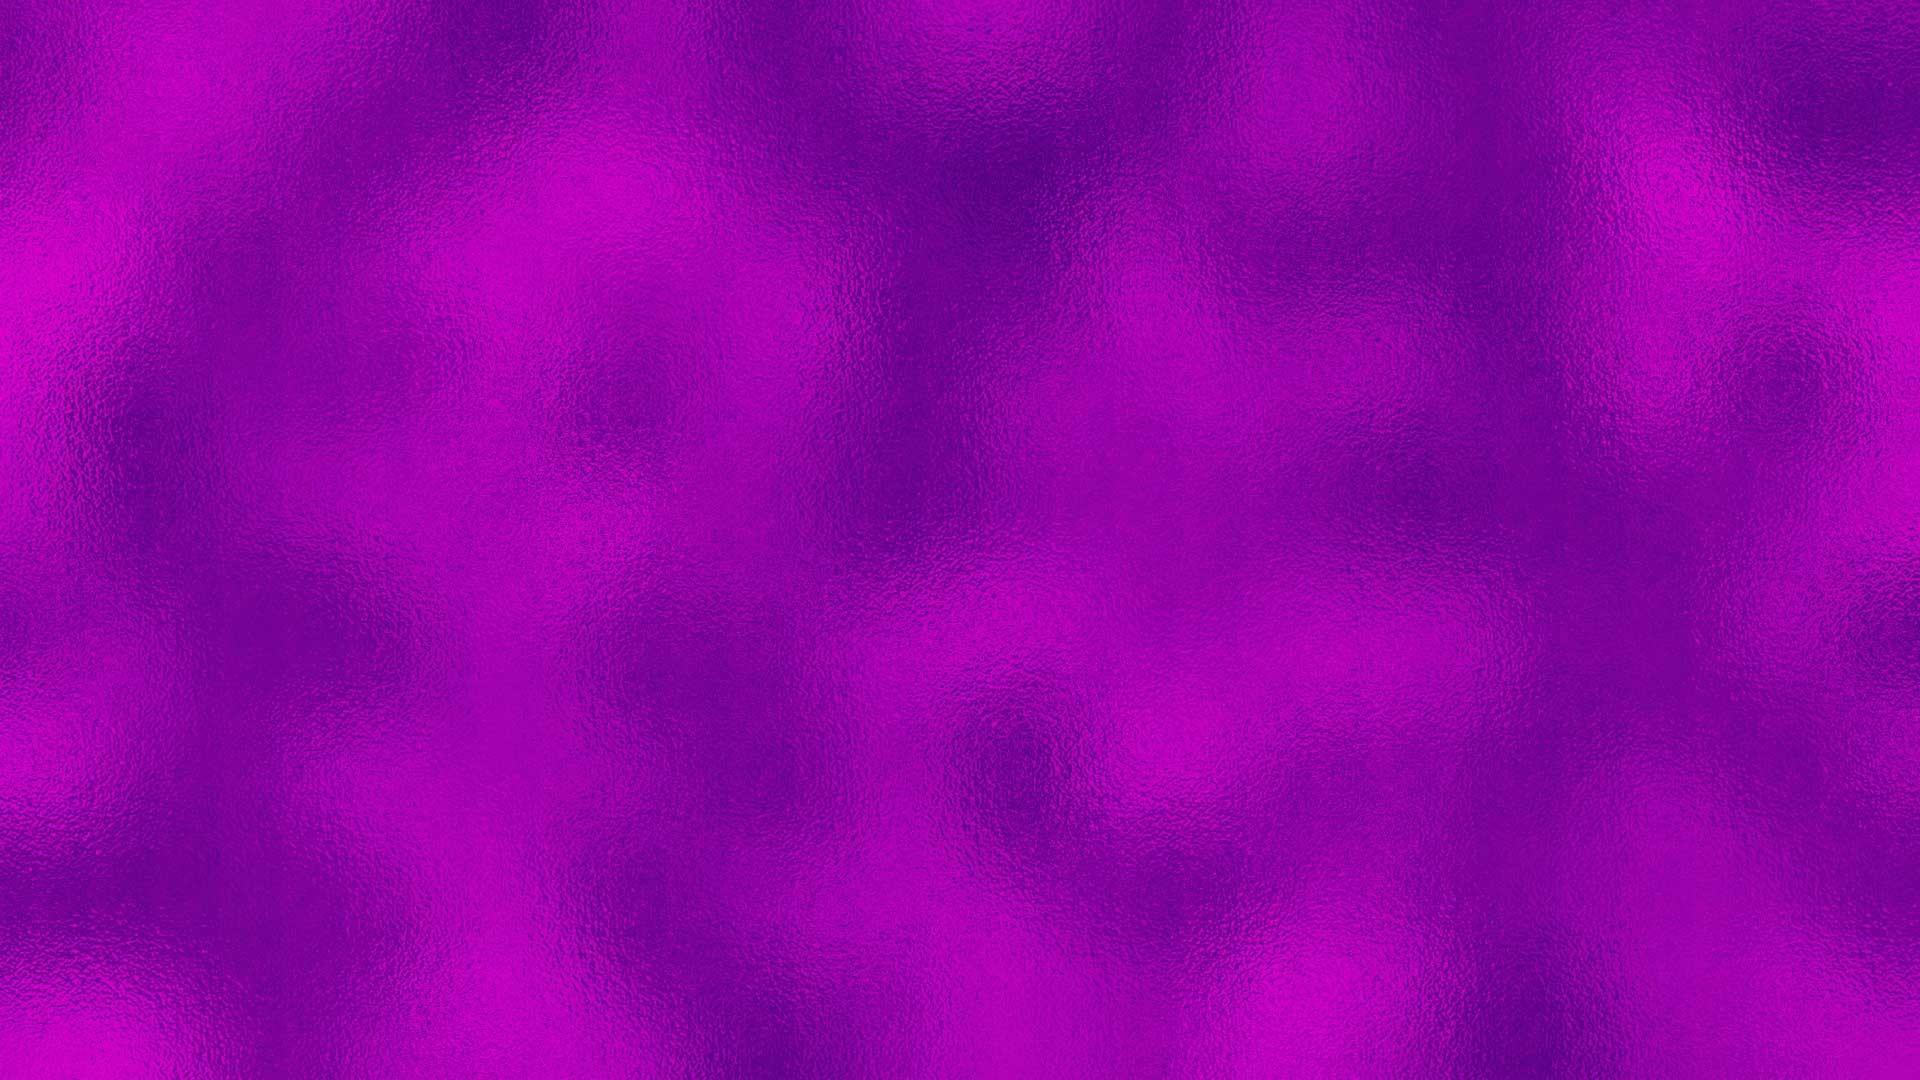 Pink Purple Backgrounds – Wallpaper Cave · wallpapercave.com